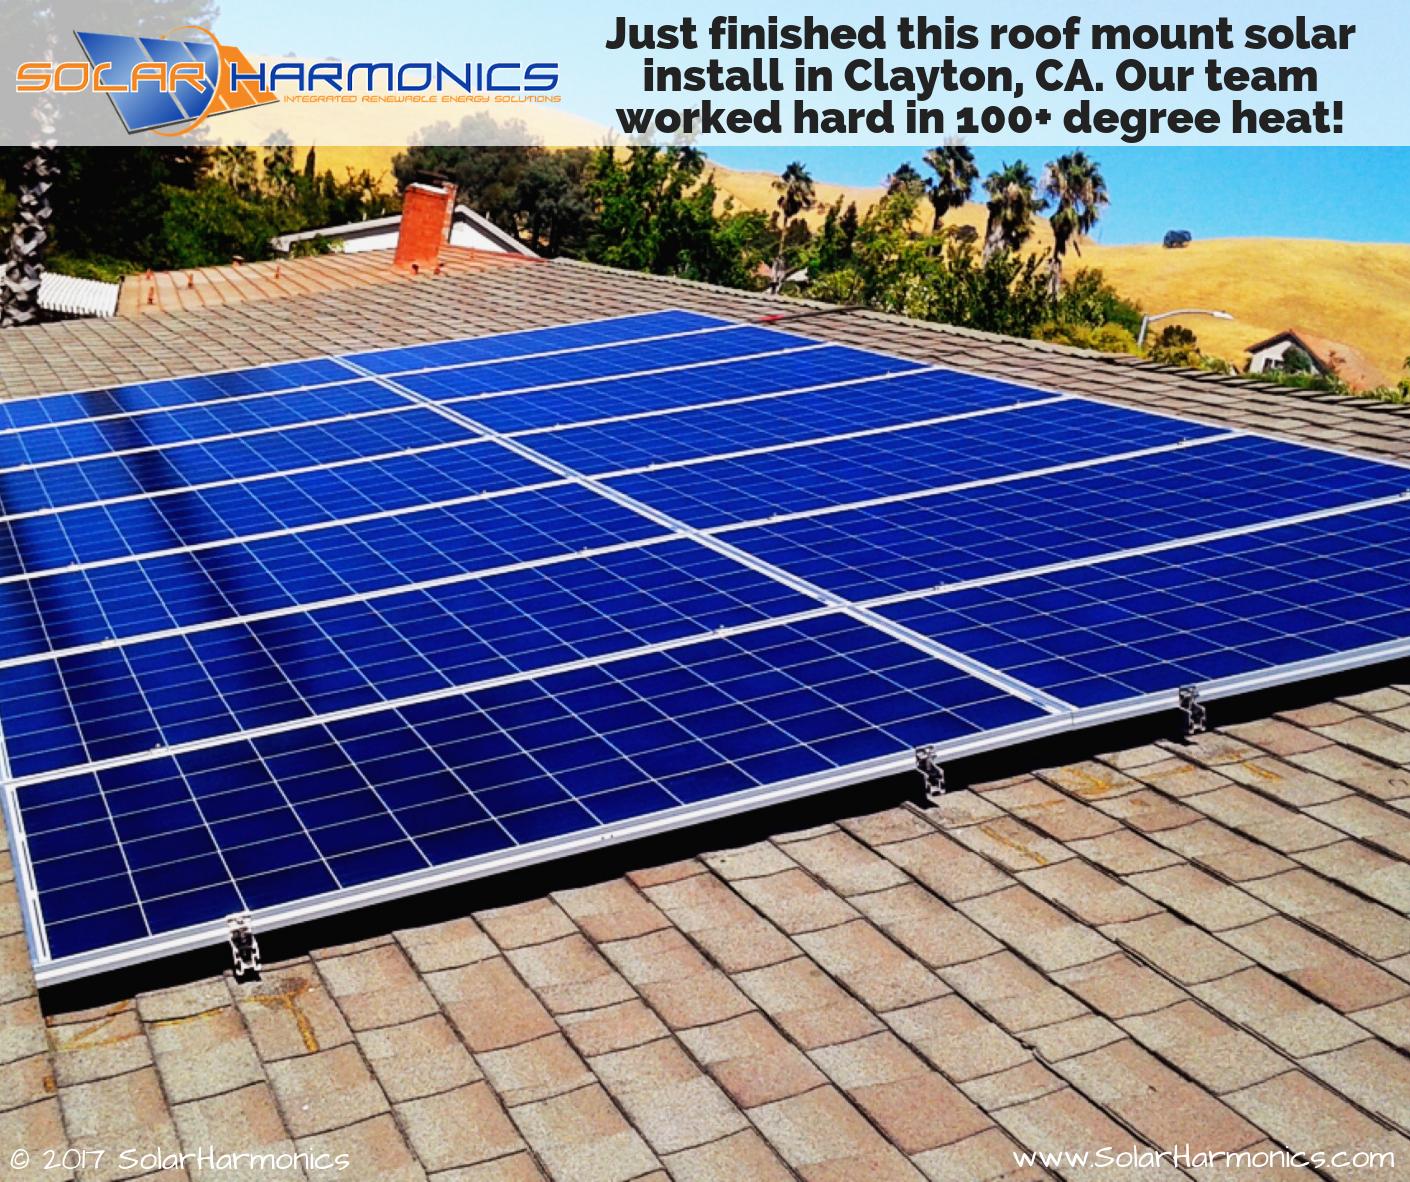 Solar_Harmonics_solar_installation_company_6001–6047-Heritage-Trail_Clayton_CA_United-States (3)